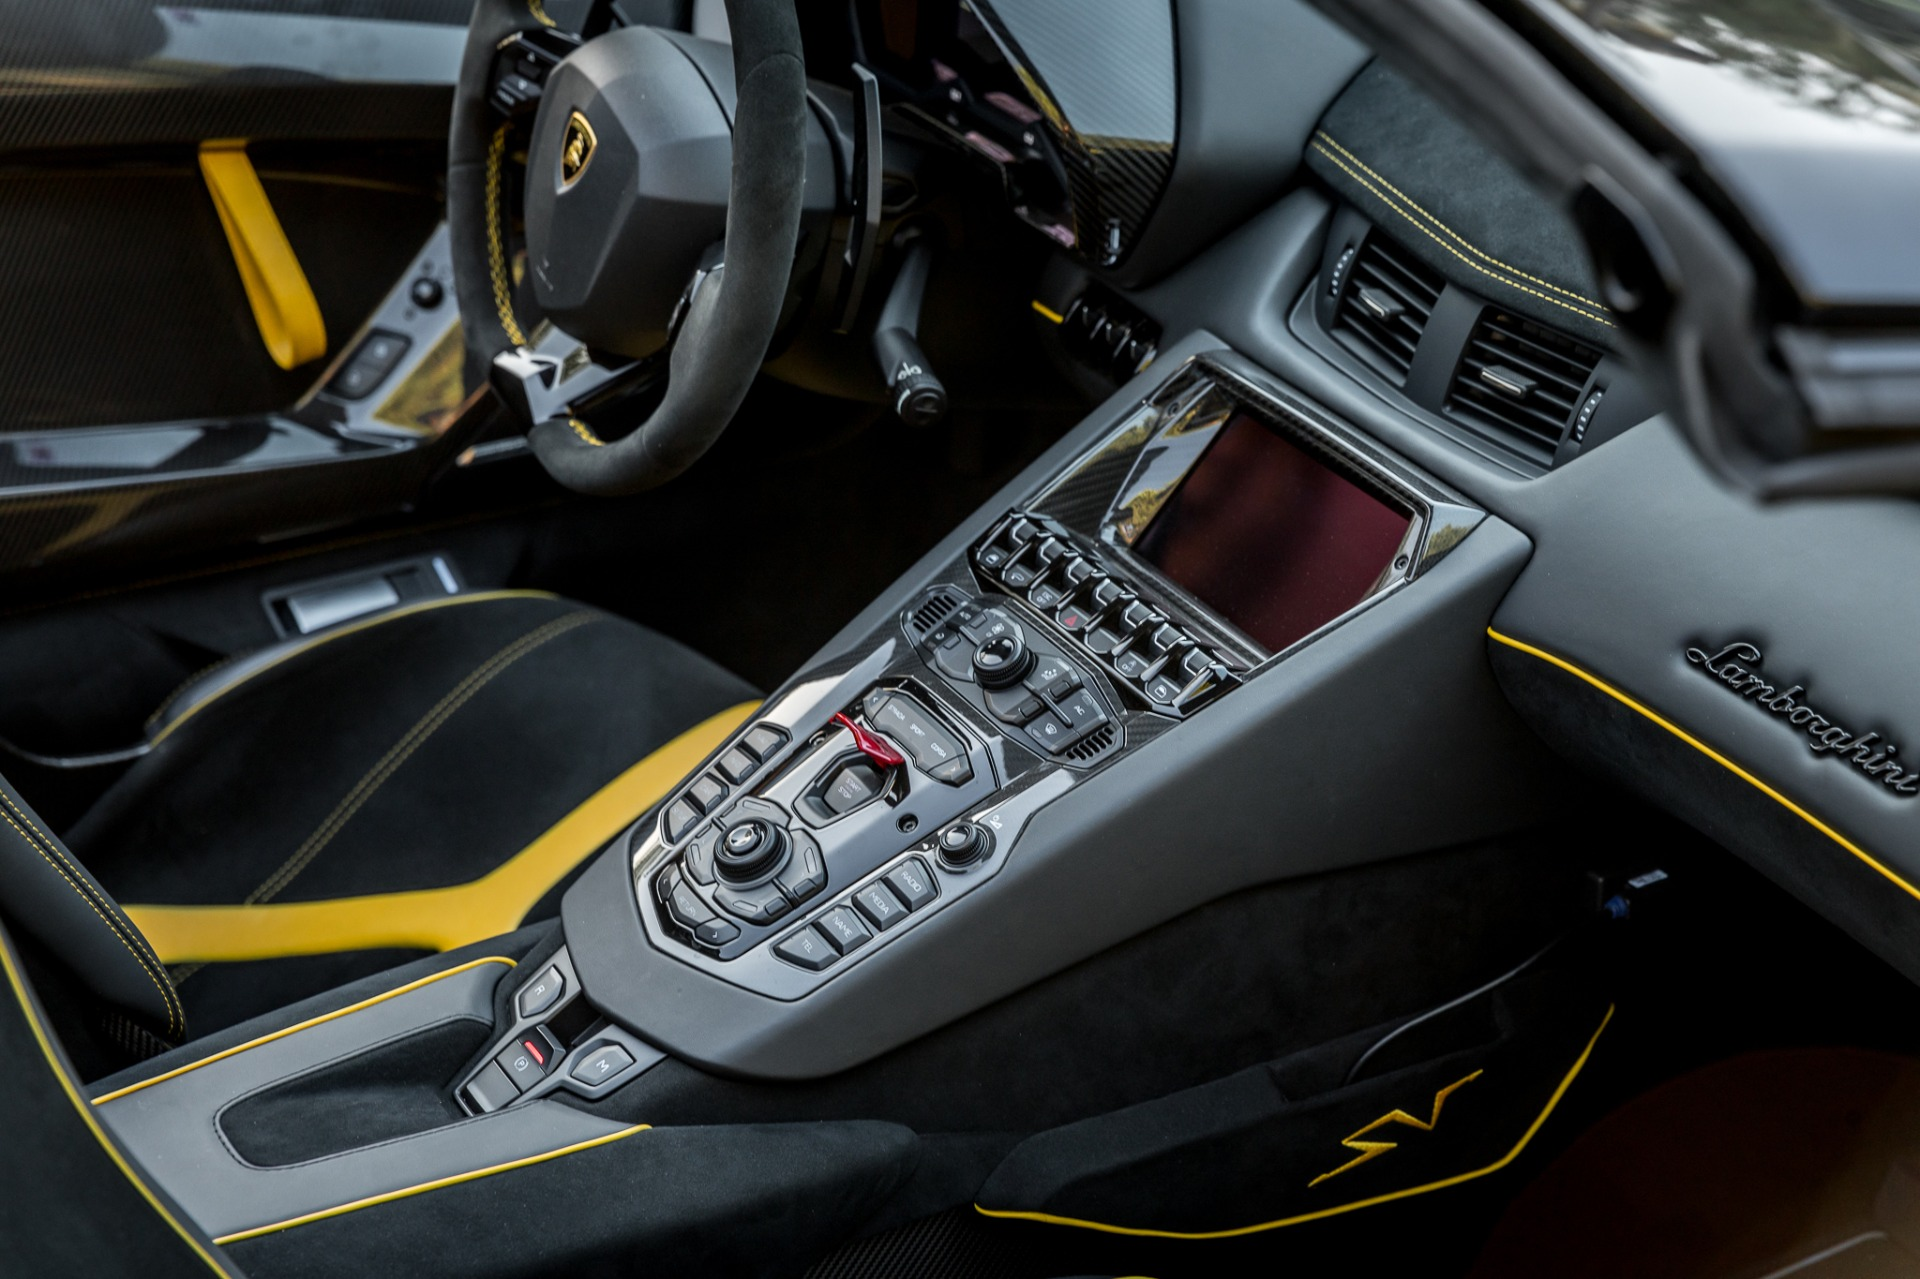 Used 2017 Lamborghini Aventador LP 750-4 SV / 740HP / AWD / 1930 MI / NAV / CAMERA for sale Sold at Formula Imports in Charlotte NC 28227 18